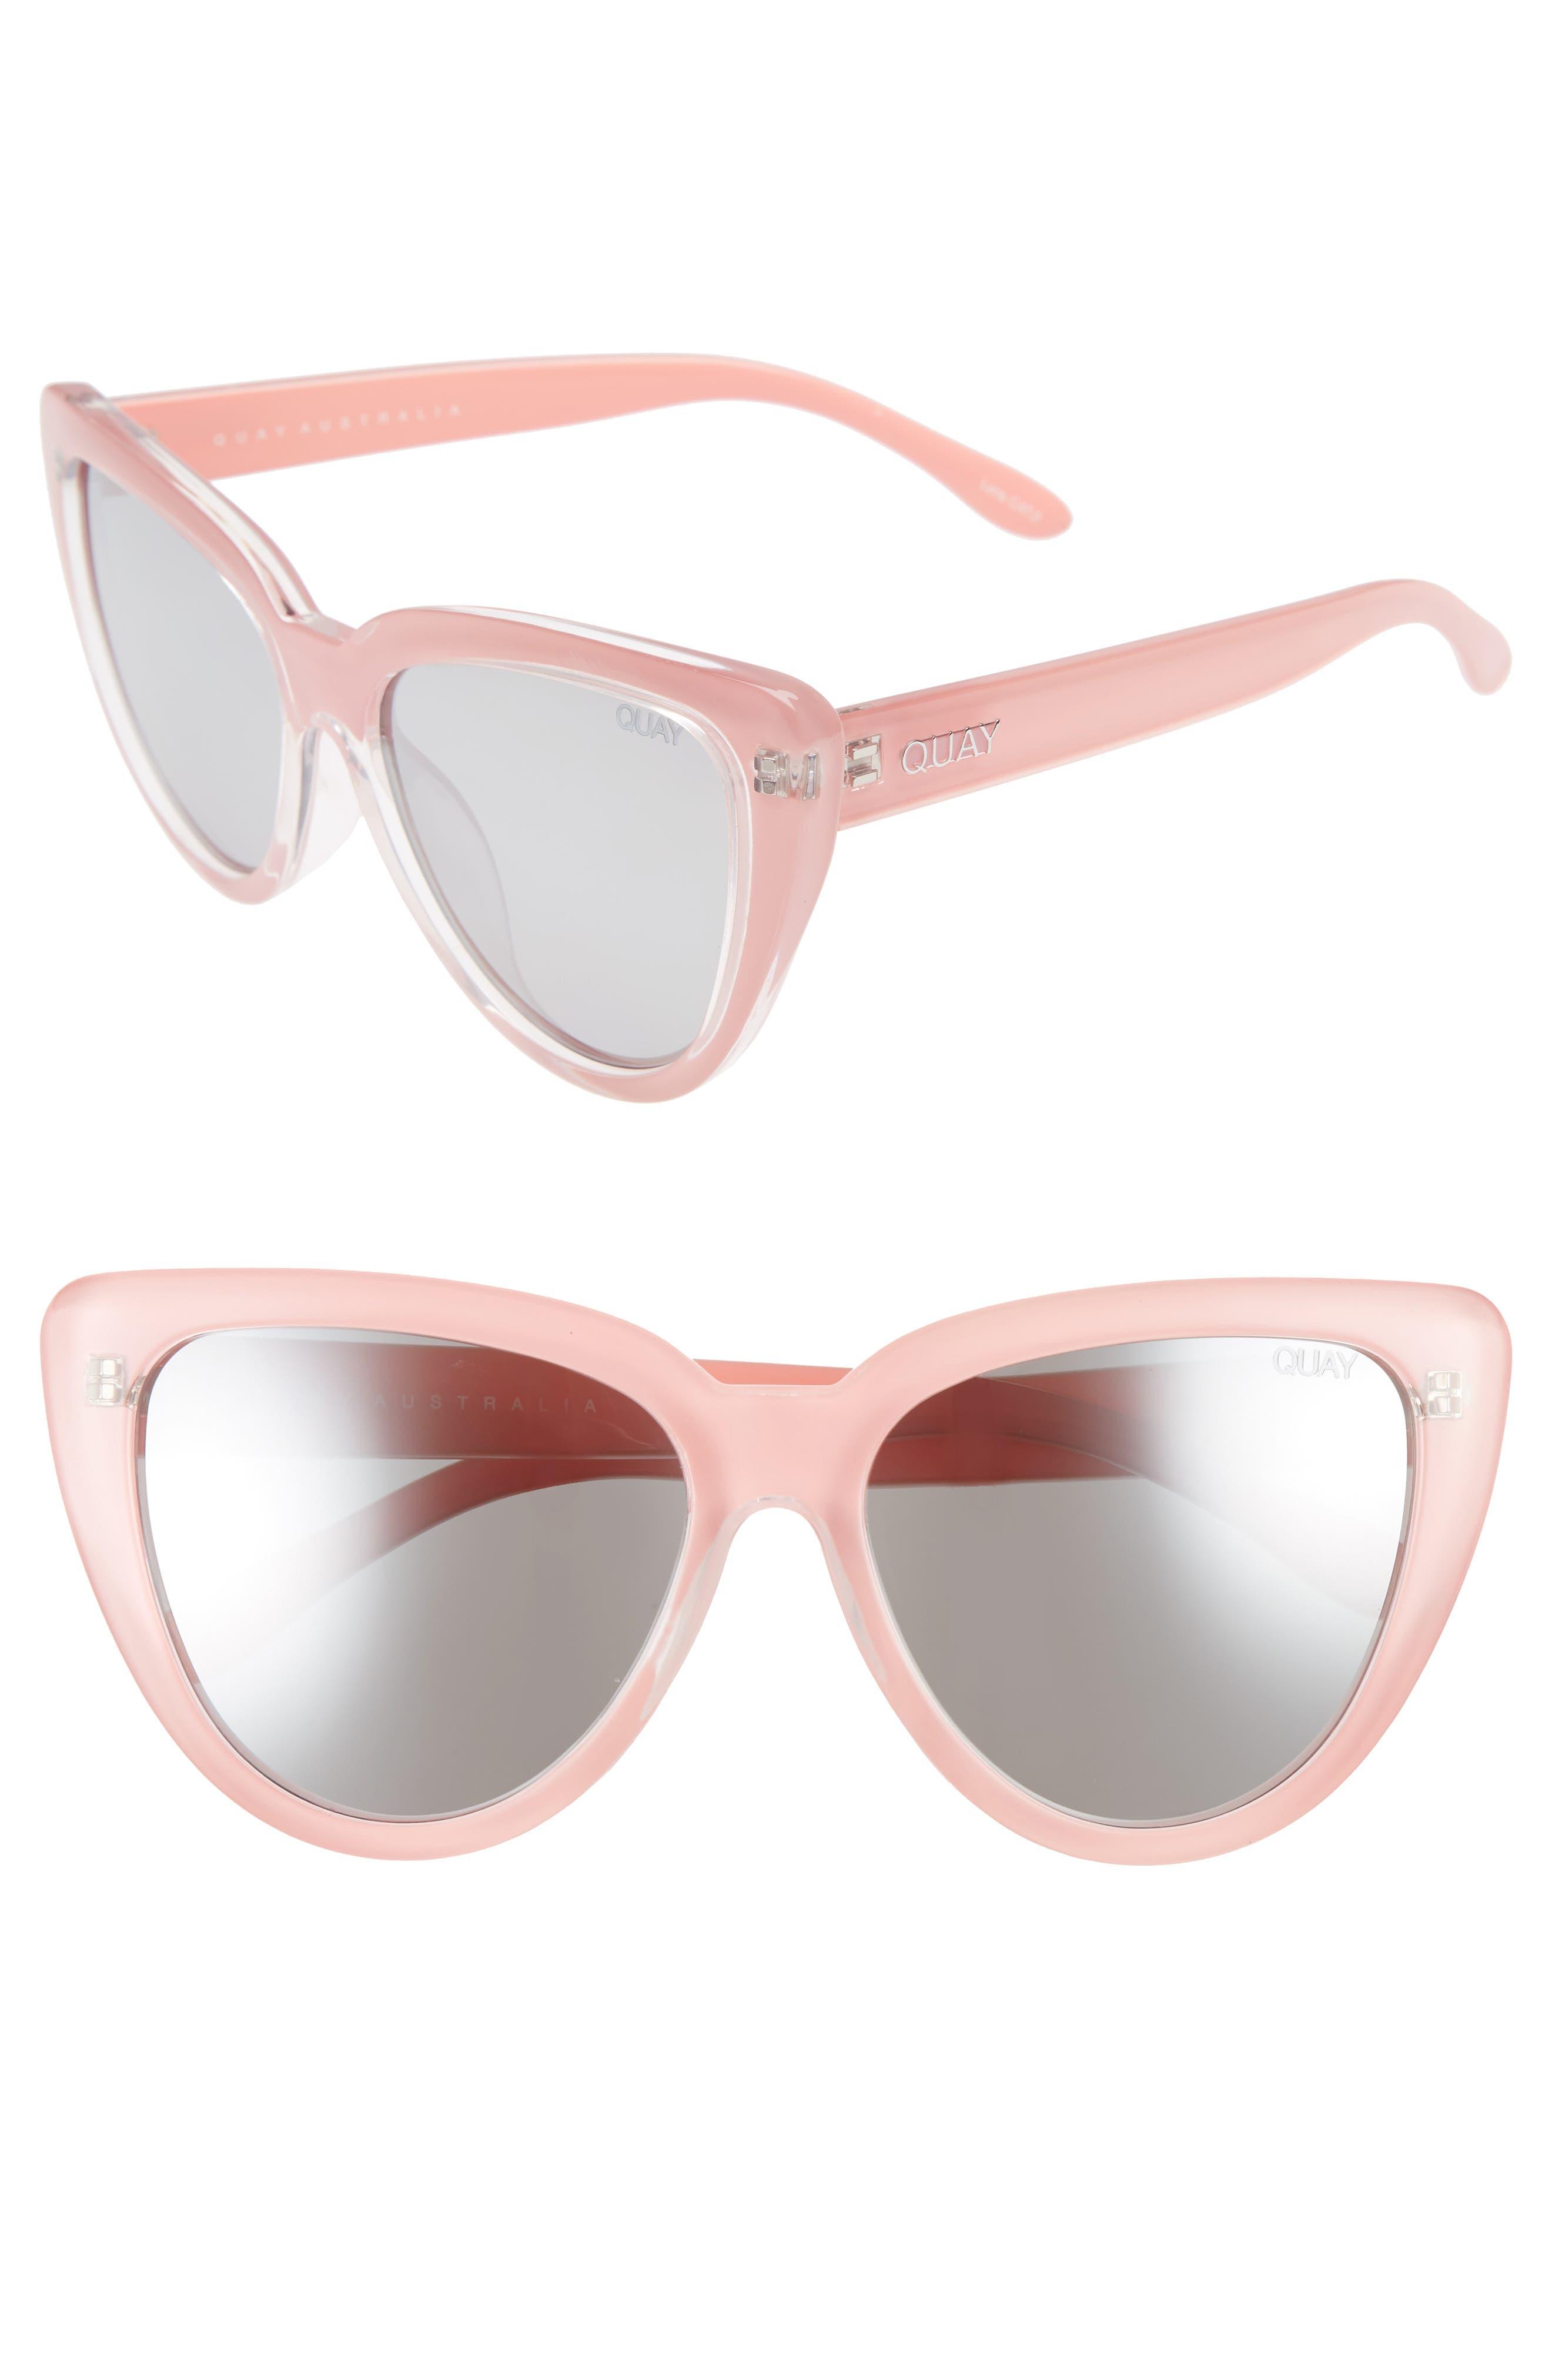 Stray Cat 58mm Mirrored Cat Eye Sunglasses,                             Main thumbnail 1, color,                             Peach/ Gradual Flash Mirror